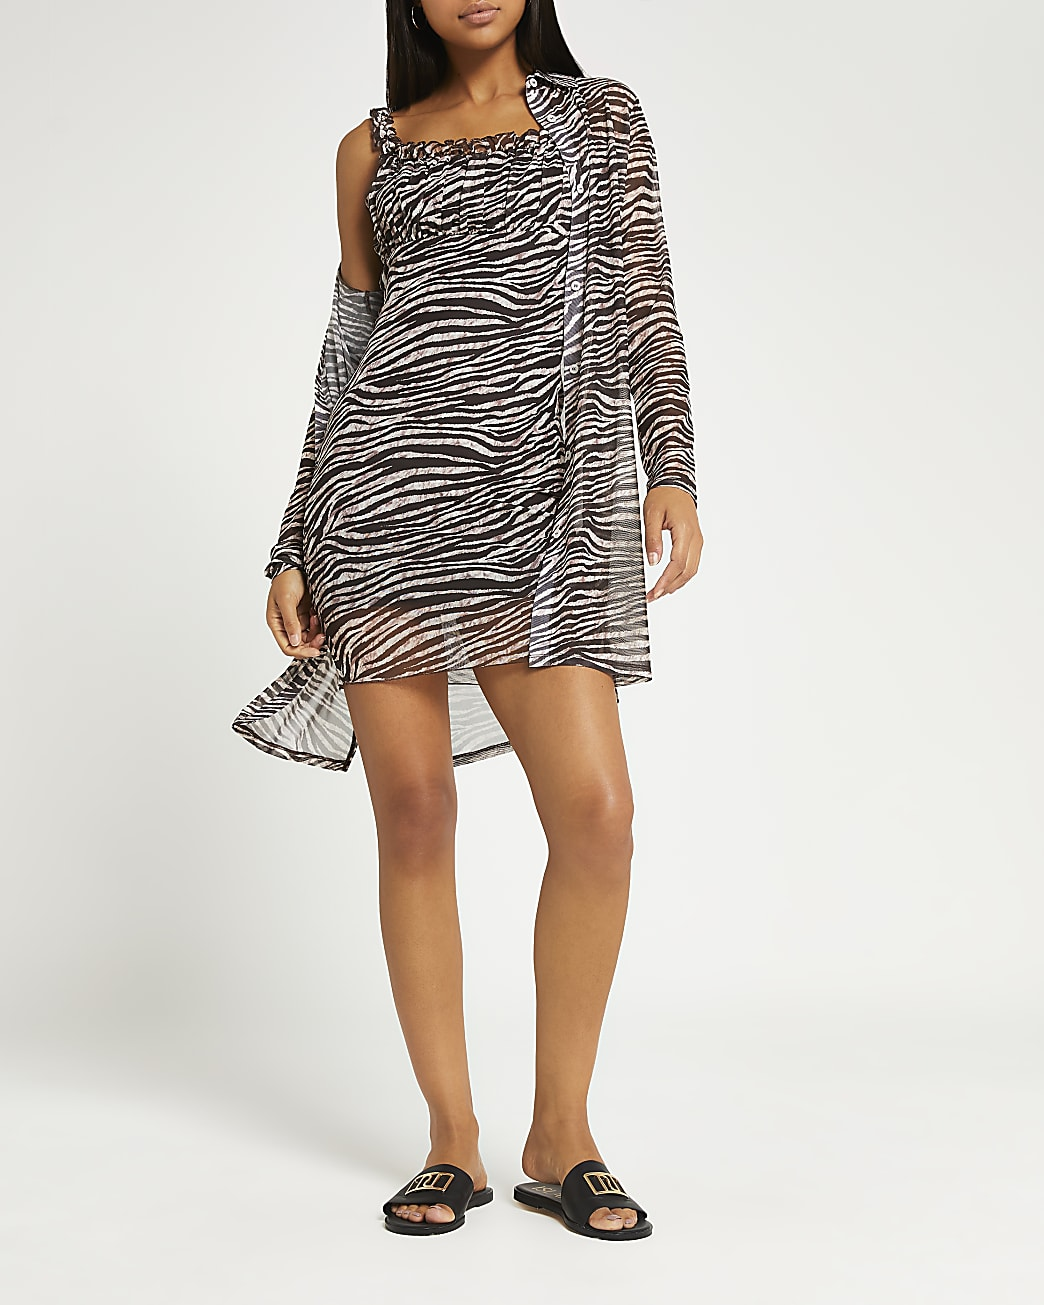 Brown animal print dress and cardigan set